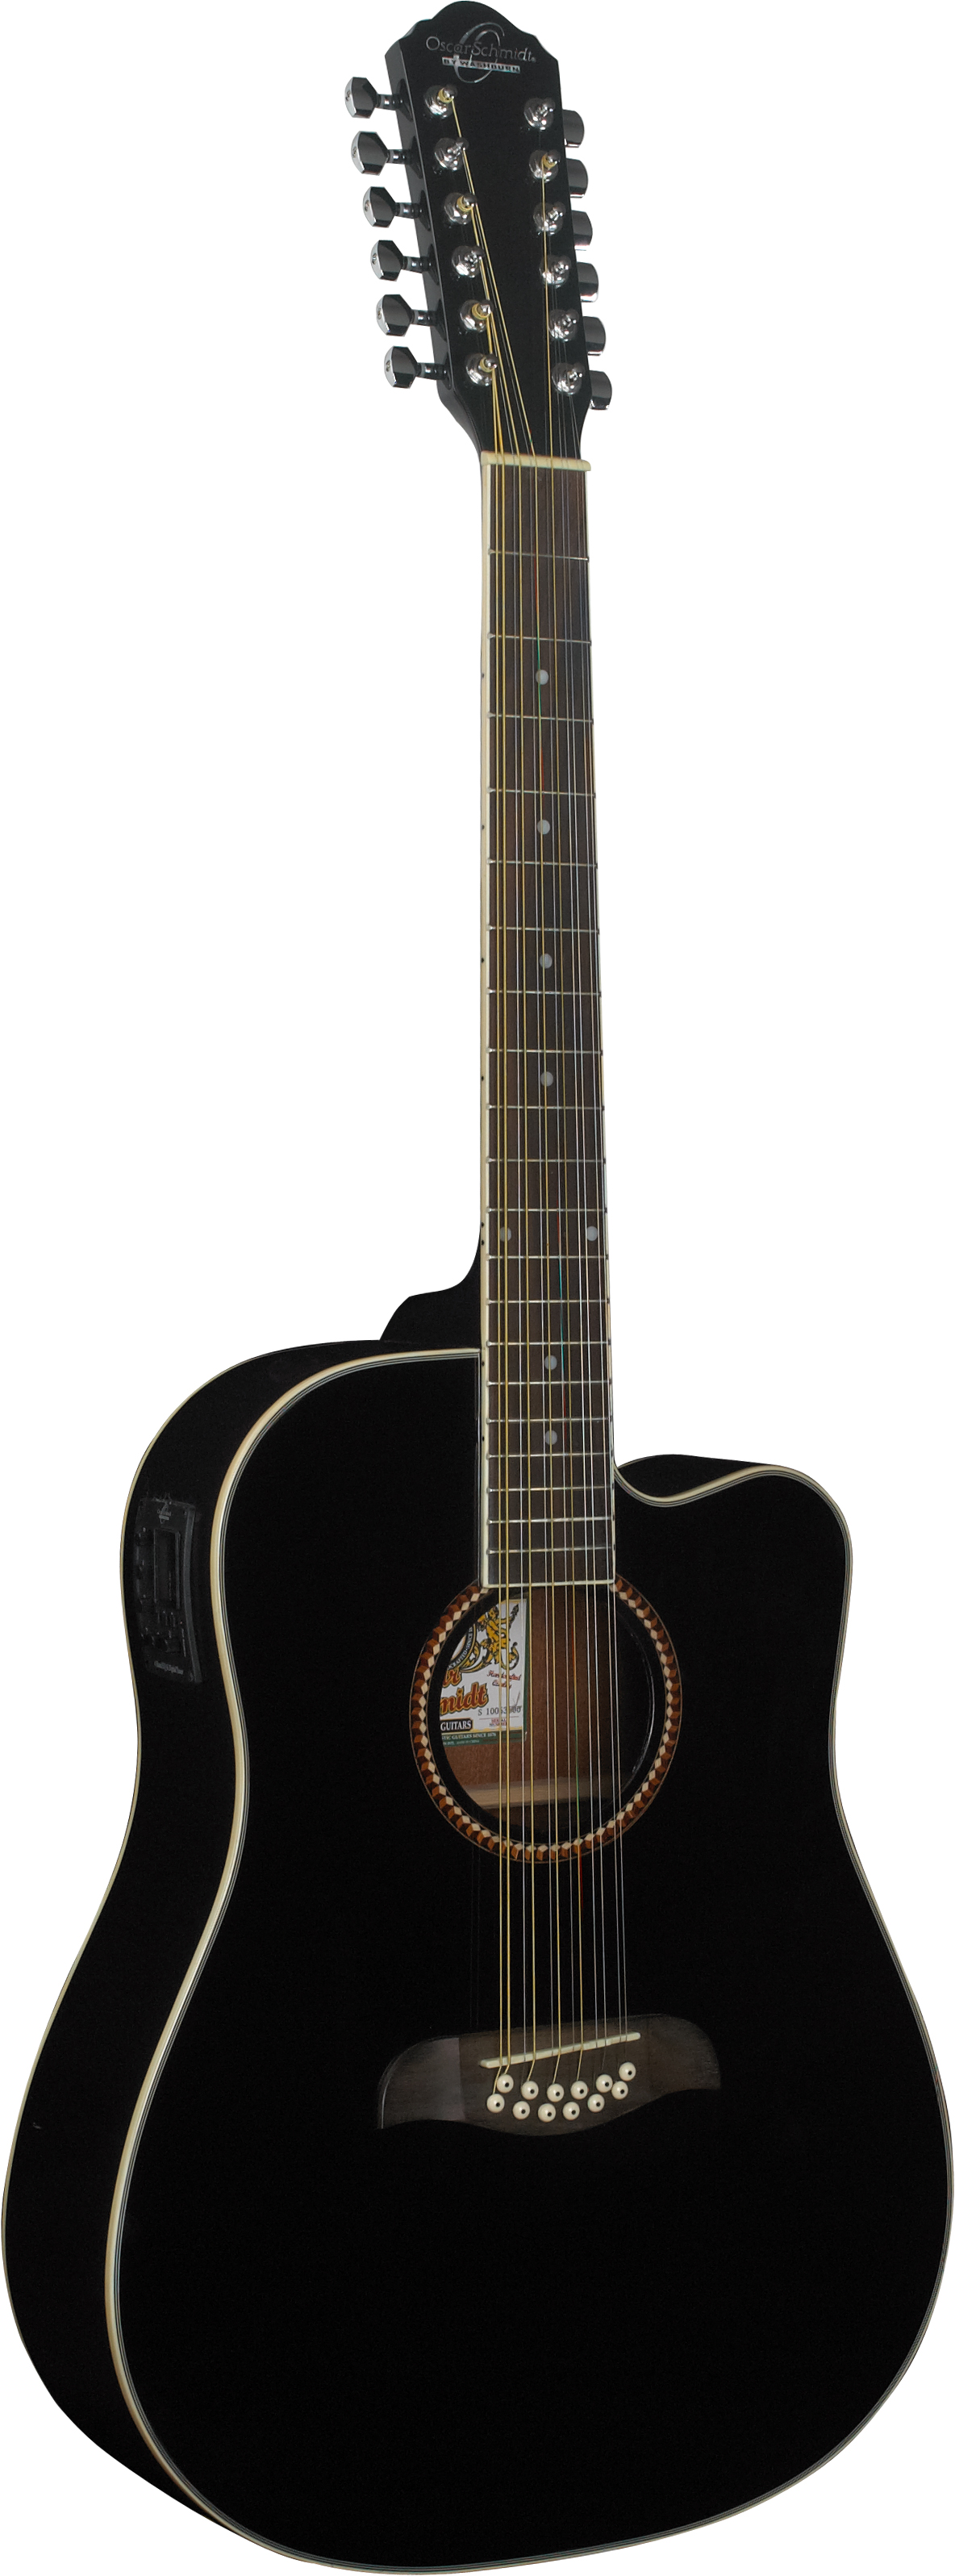 Oscar Schmidt 12-String Acoustic Electric Guitar. Black by KMC Music